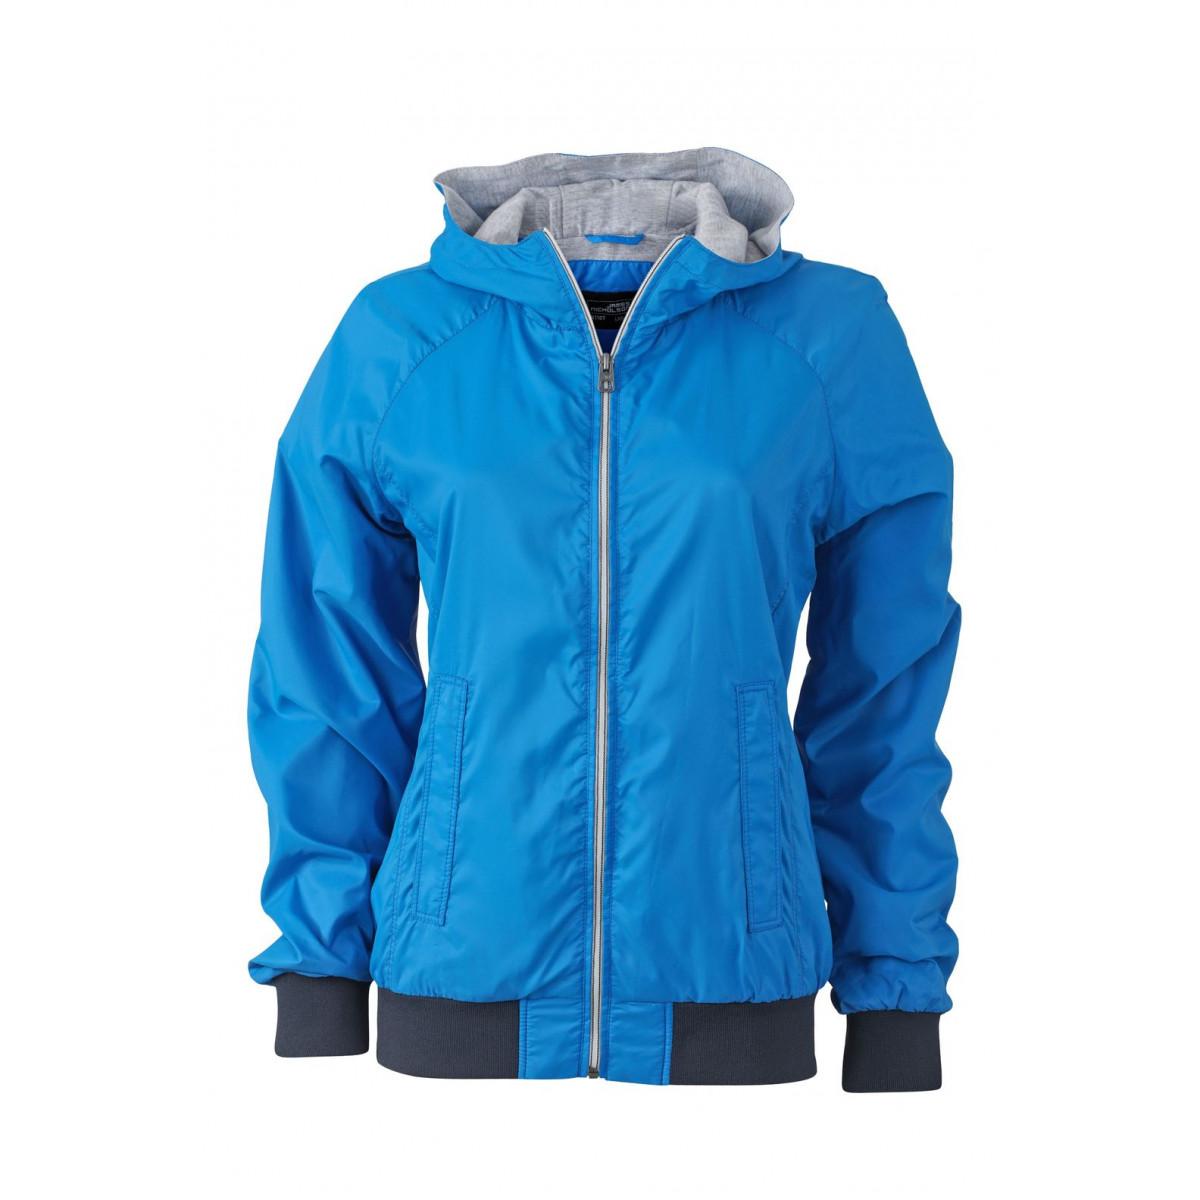 Куртка женская JN1107 Ladies Sports Jacket - Кобальт/Темно-синий